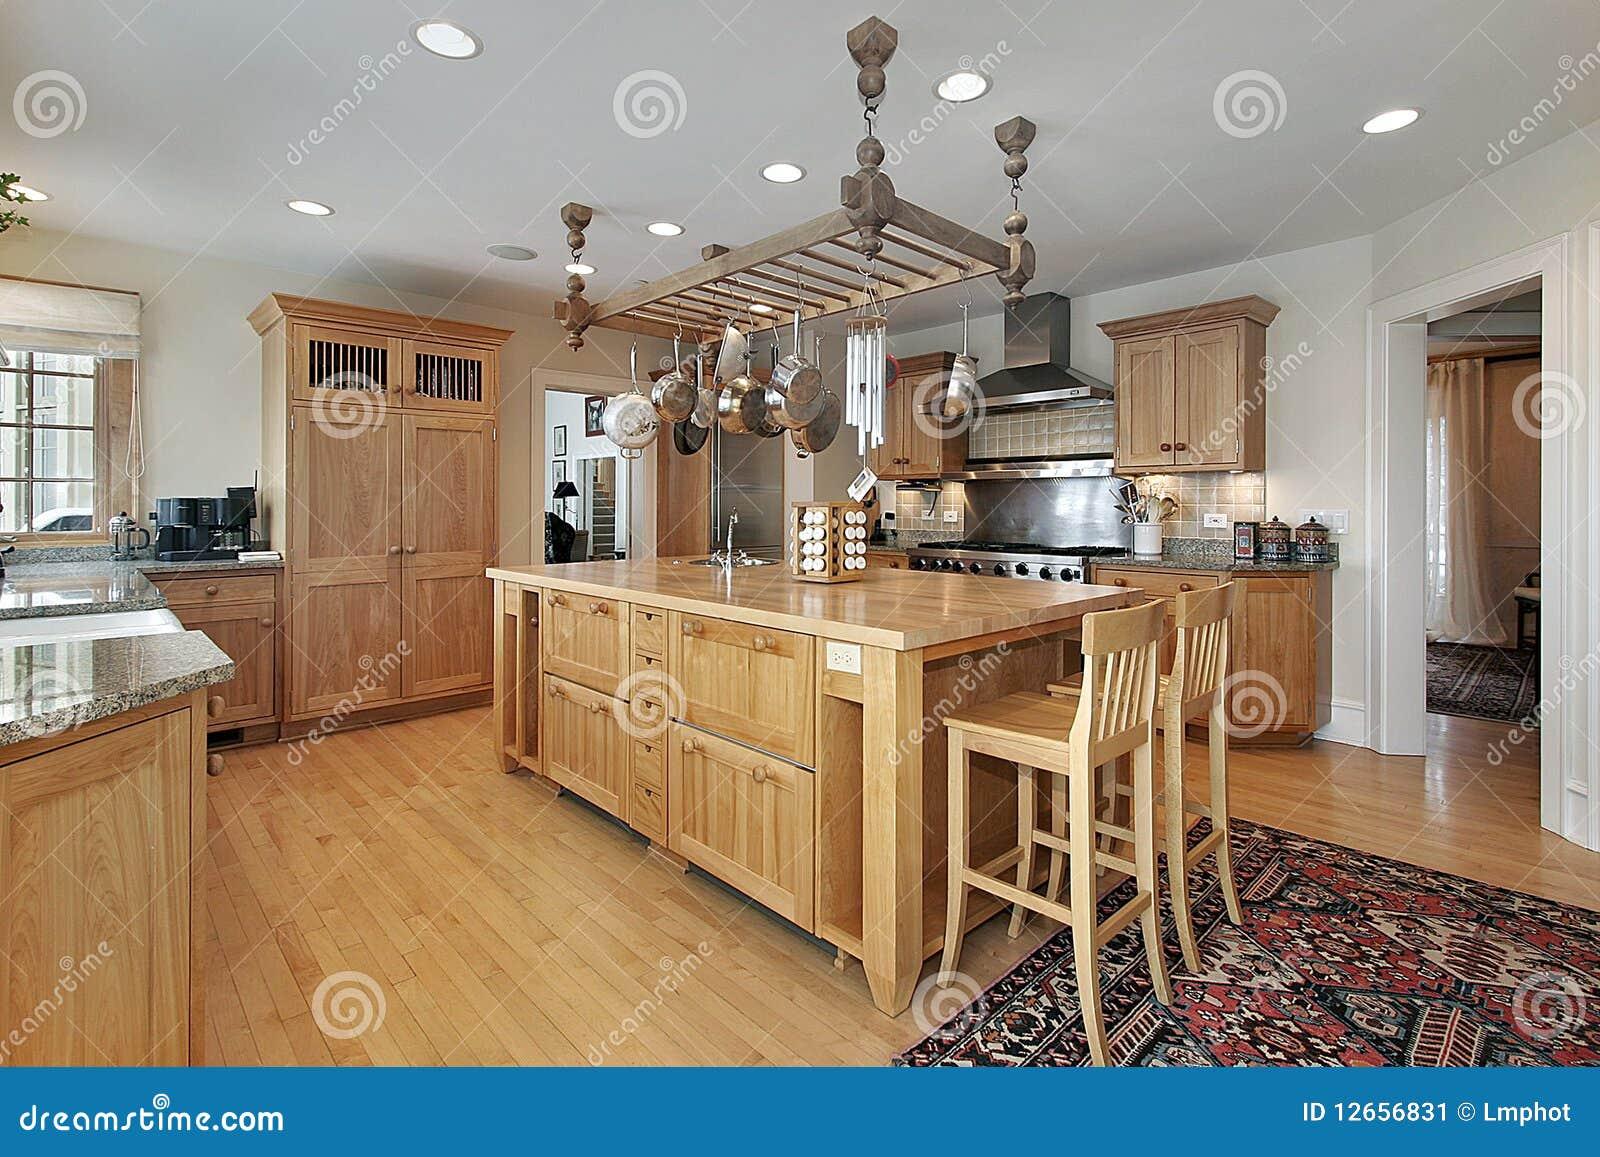 kitchen with butcher block island stock image image 12656831 home island kitchen